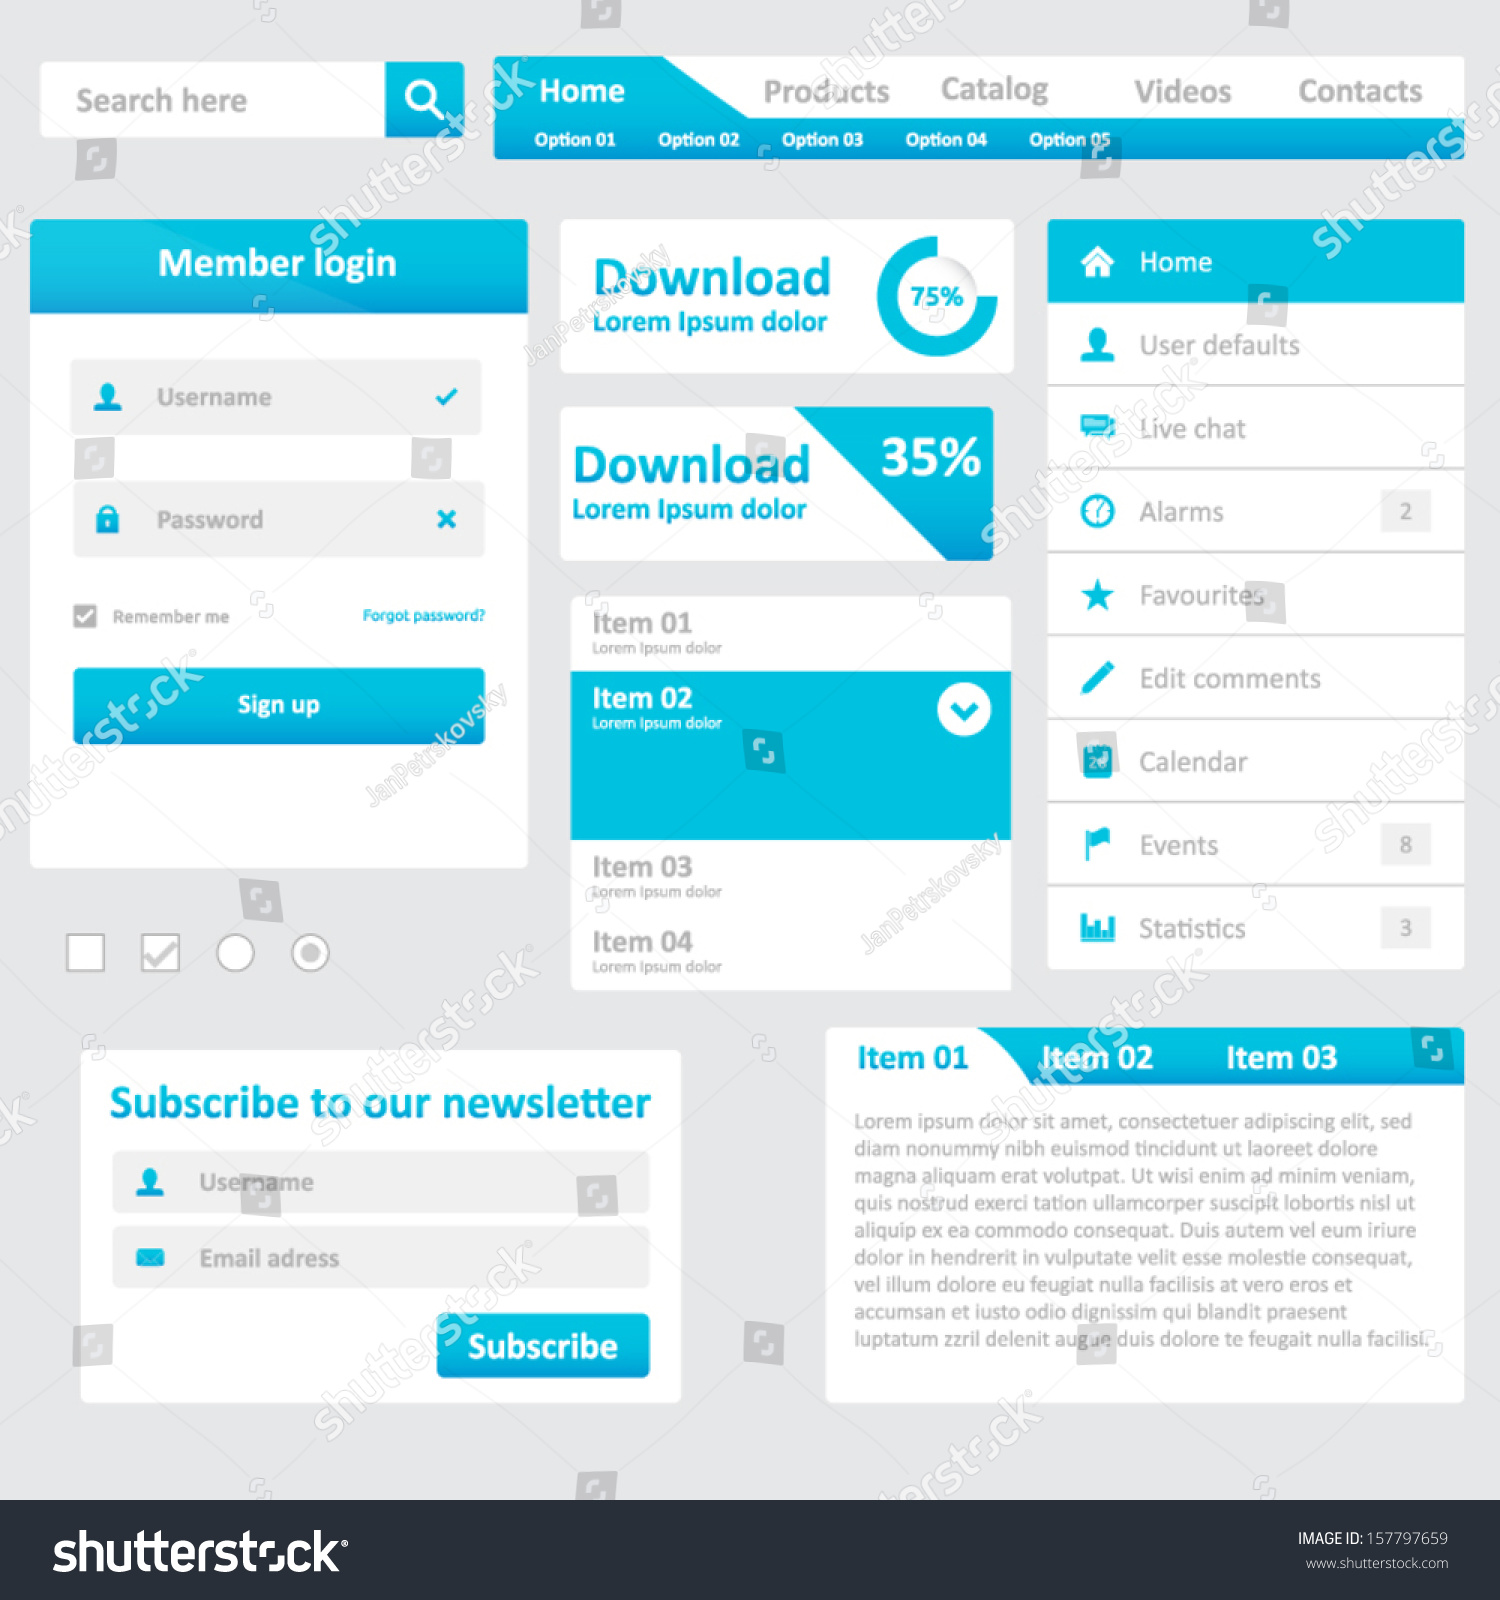 Showcase of Beautiful Search Box UI Designs - Hongkiat